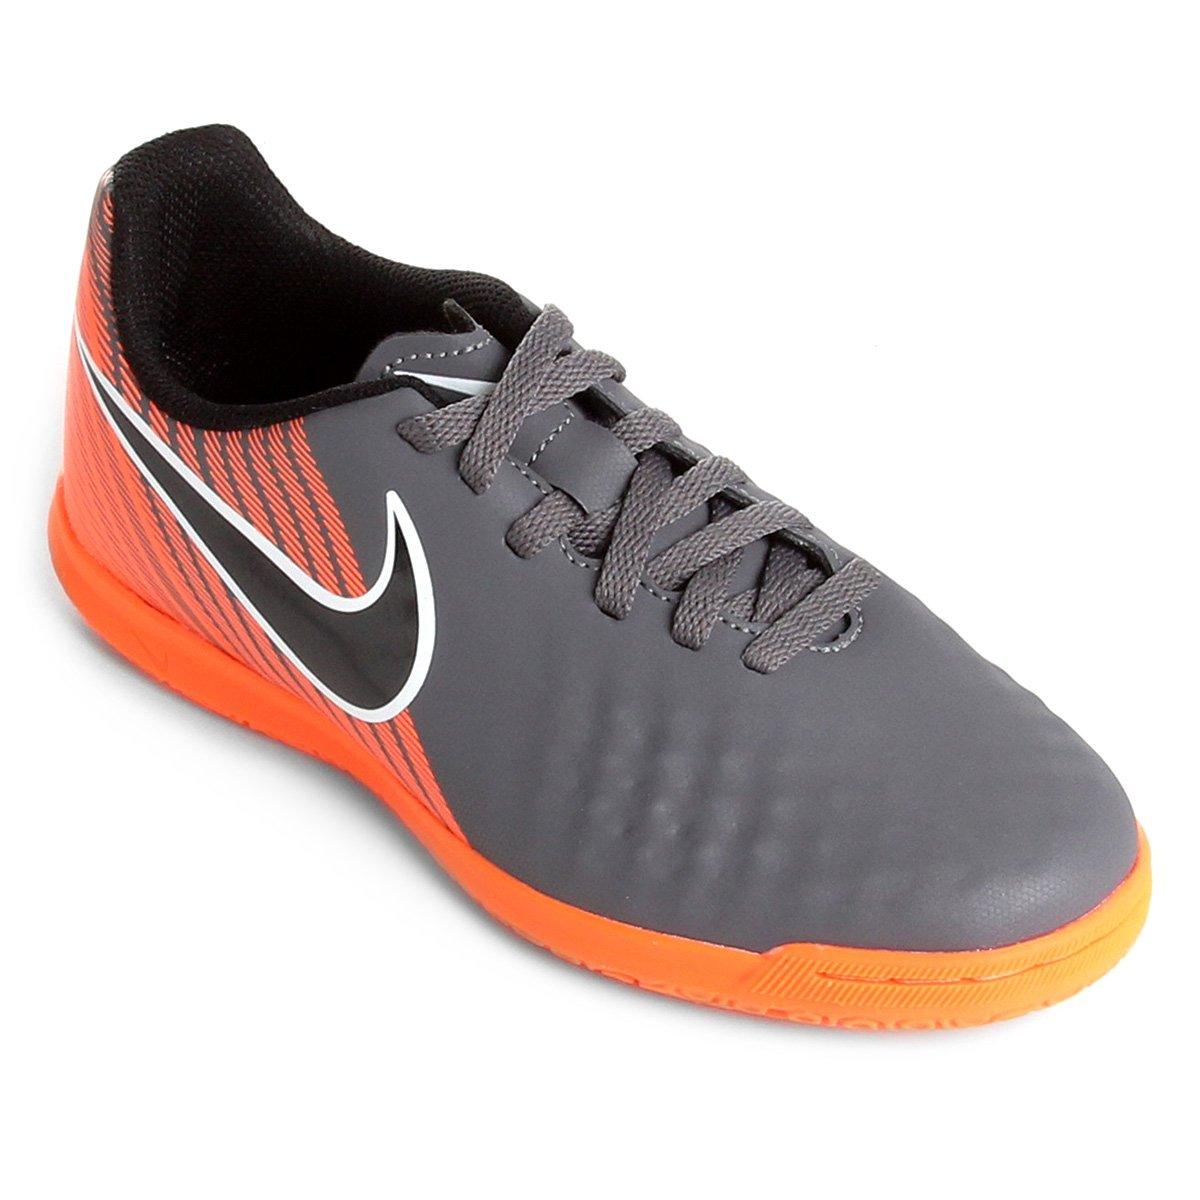 Chuteira Futsal Nike Mercurial Vapor 12 Academy Masculina Laranja 3bdc2e8692c7c